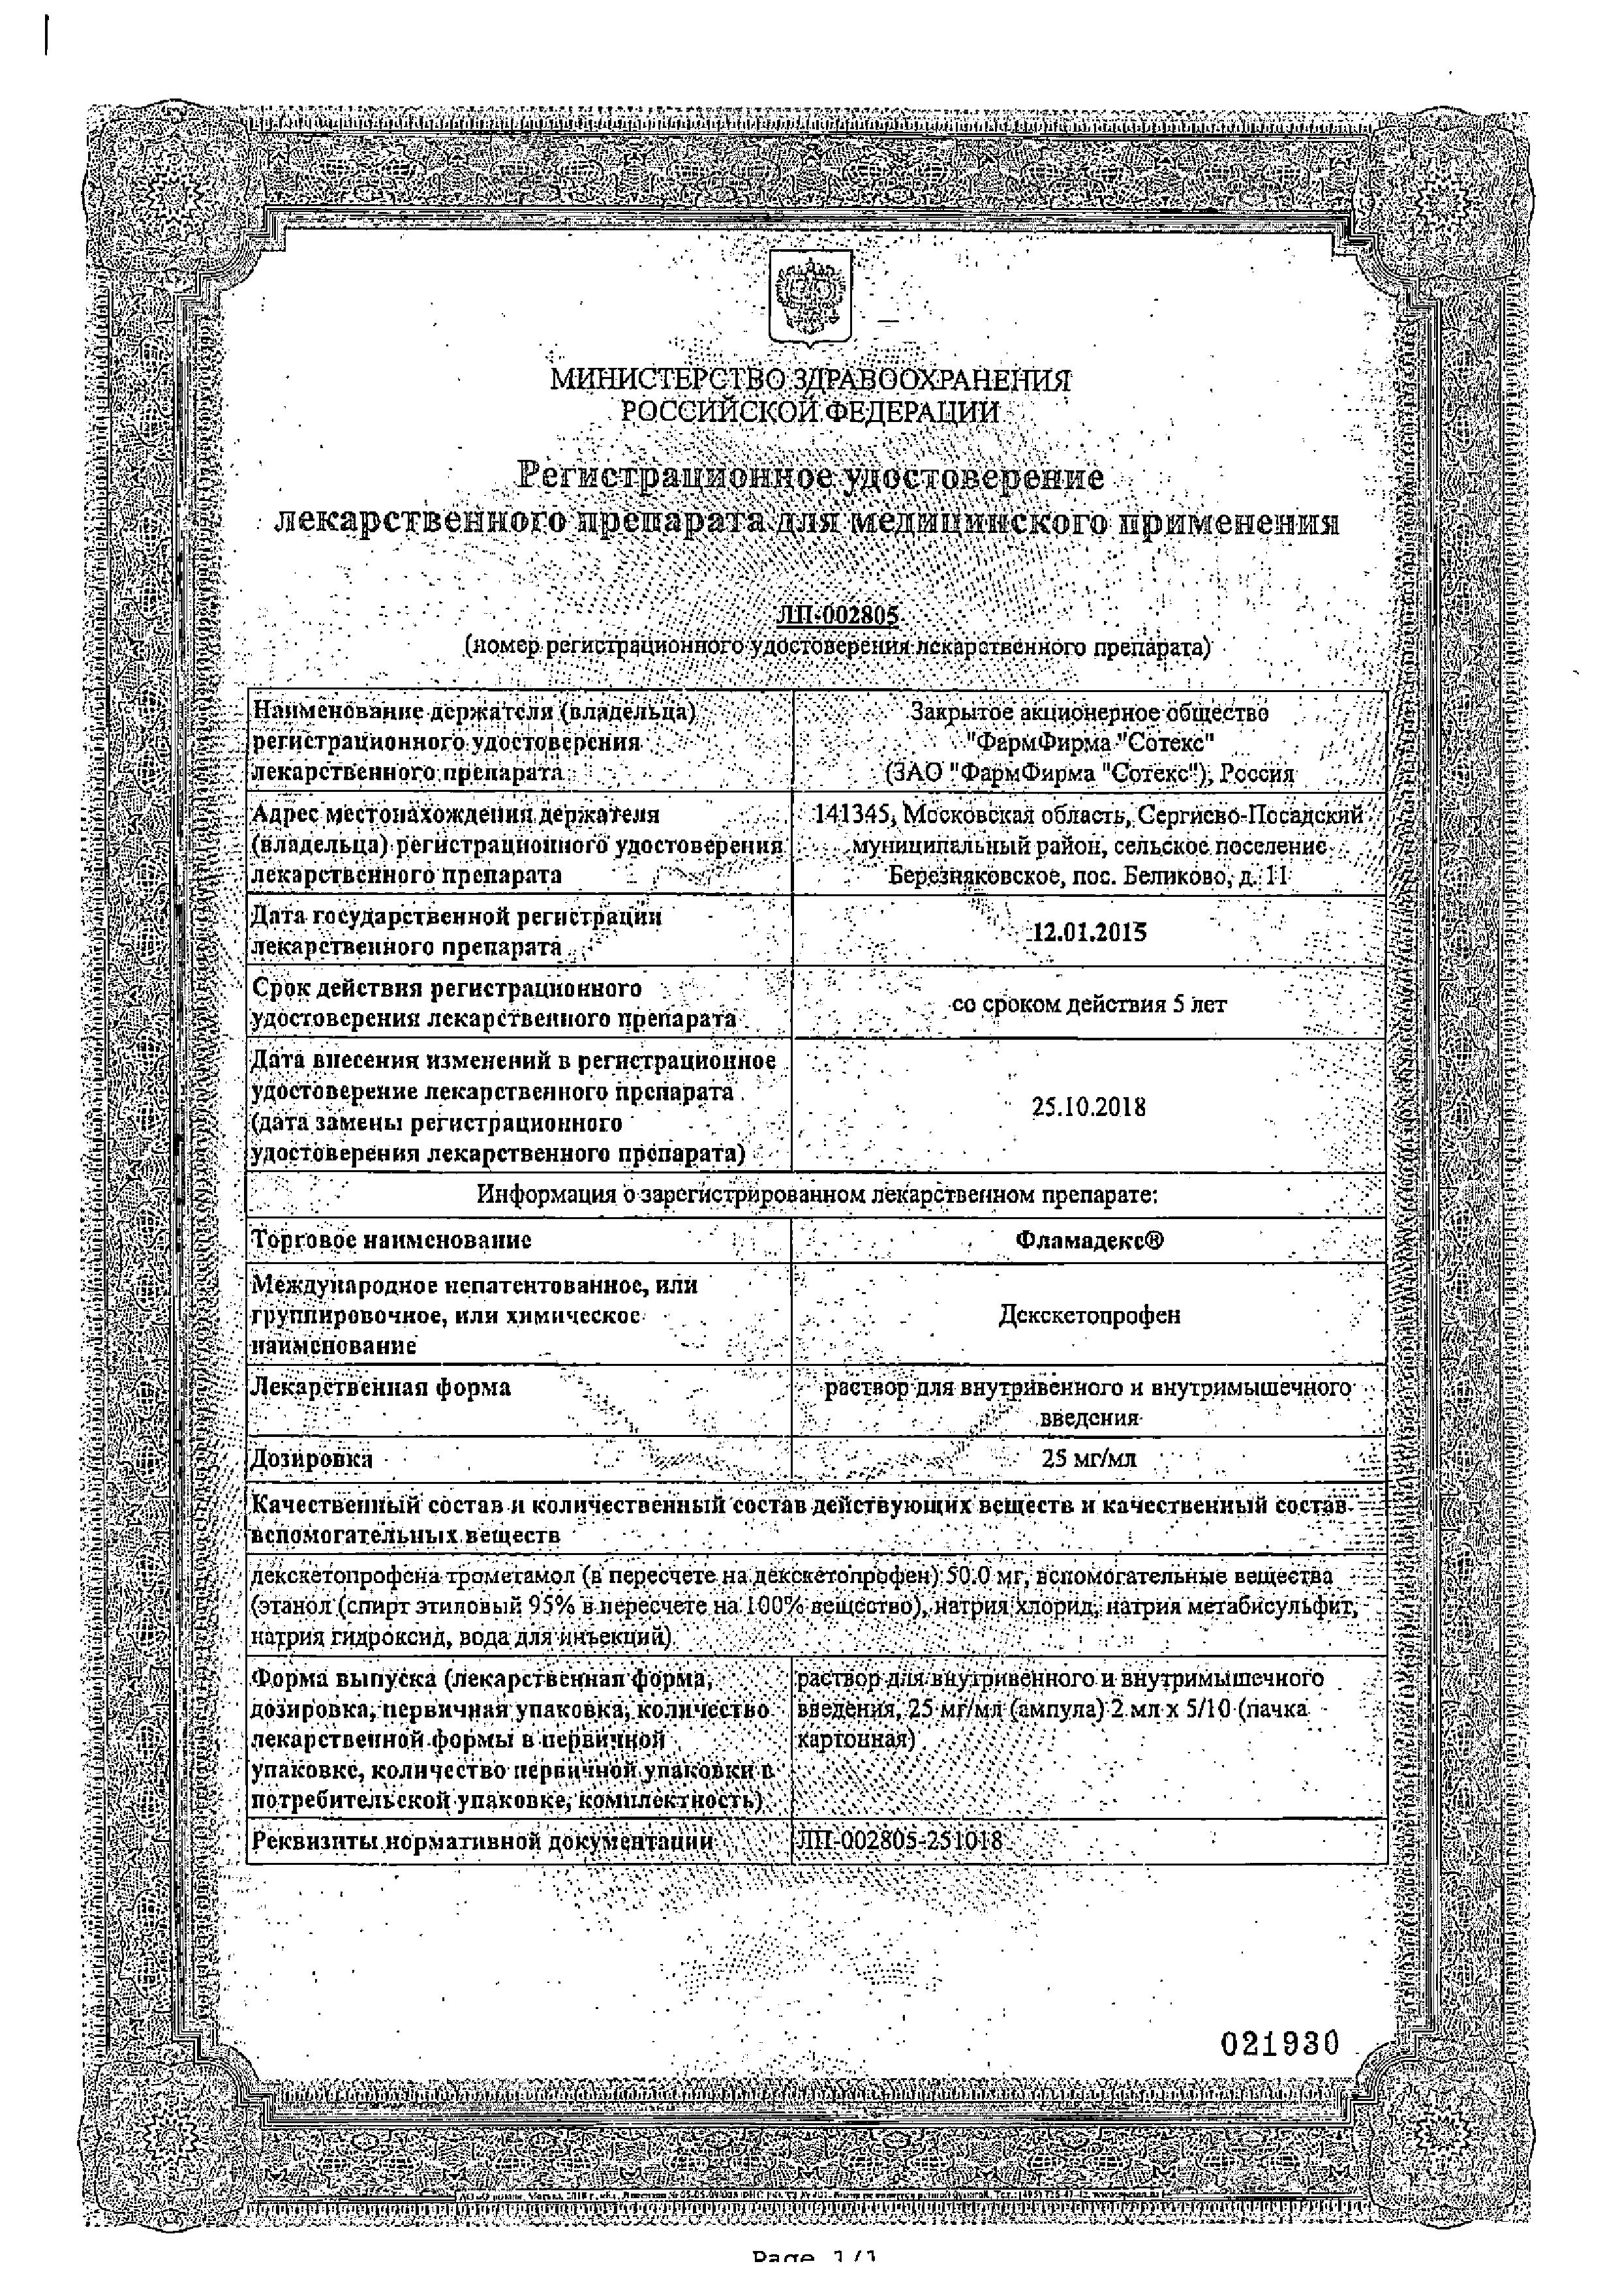 Фламадекс сертификат